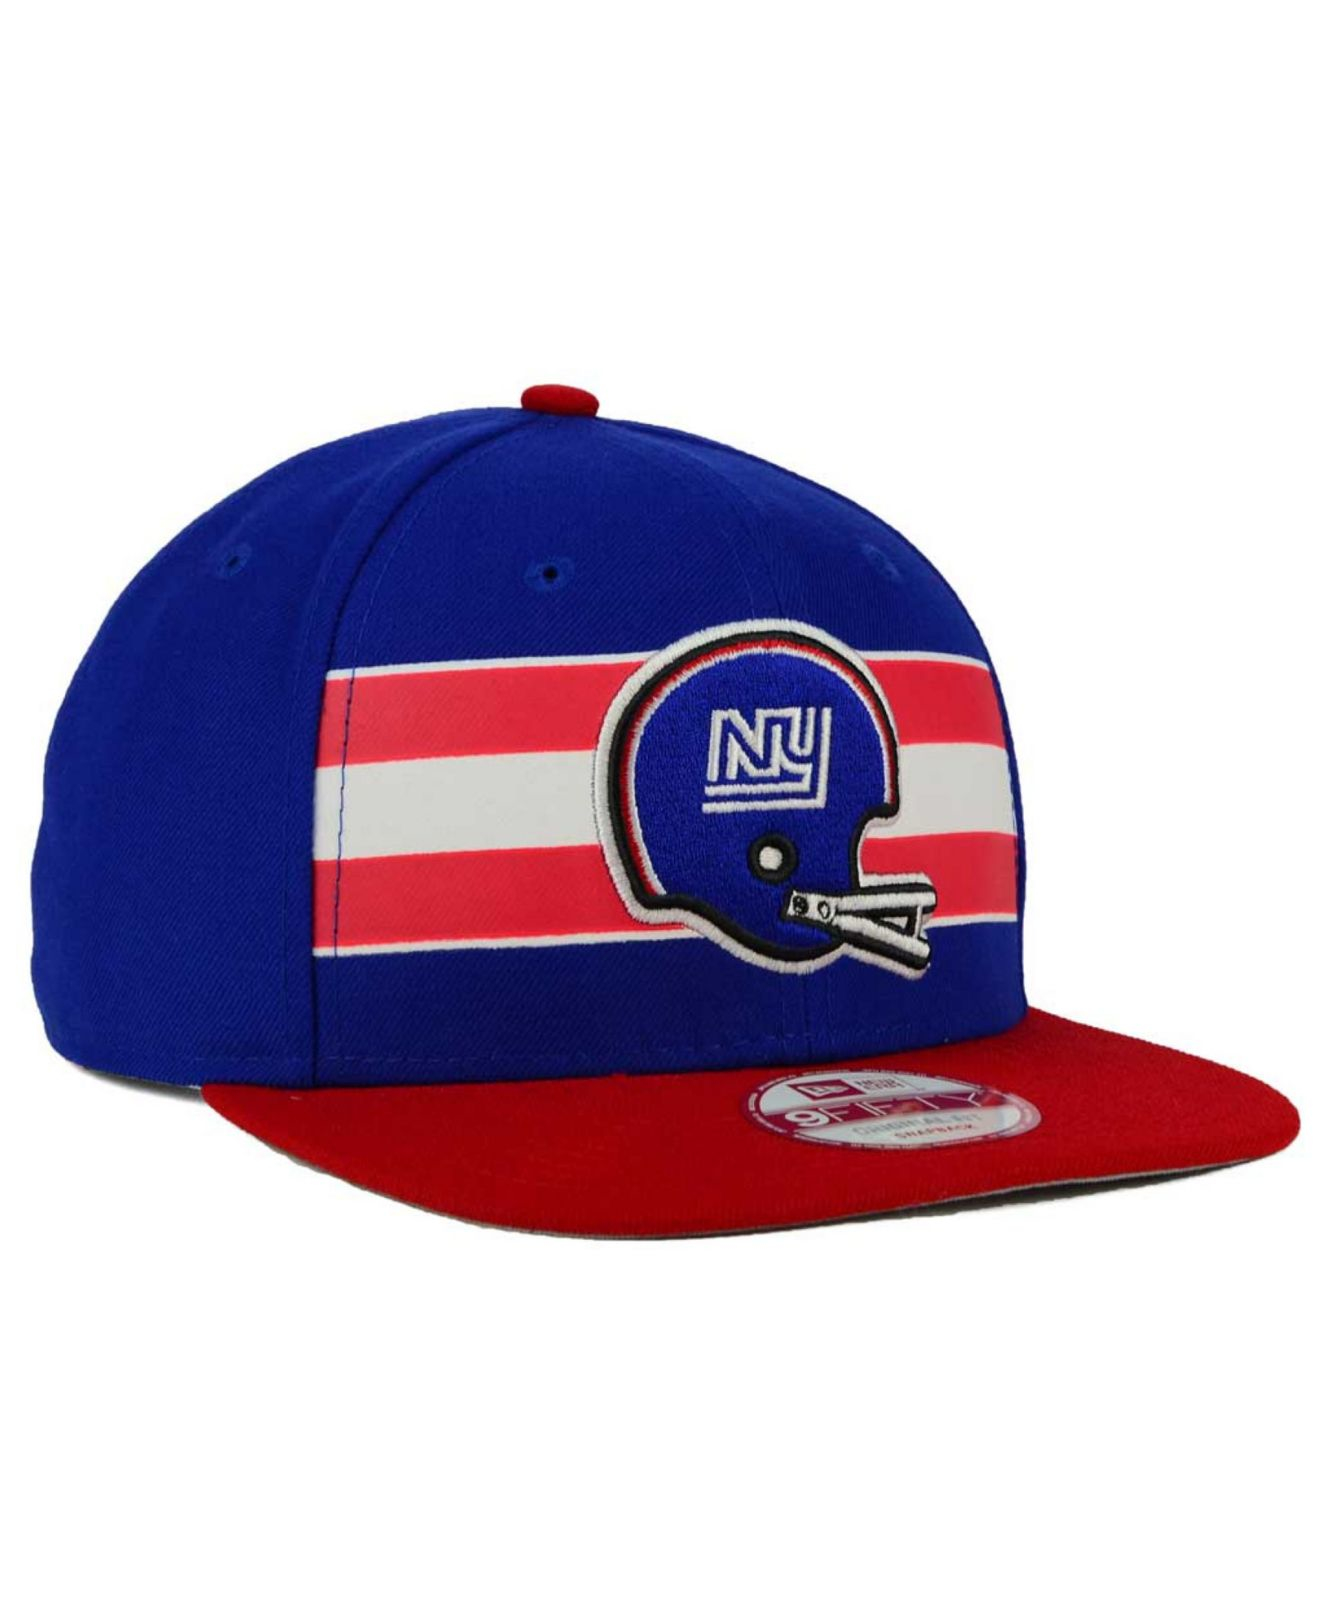 Lyst - KTZ New York Giants Retro Striped 9fifty Snapback Cap in Blue ... 972b1ada3138